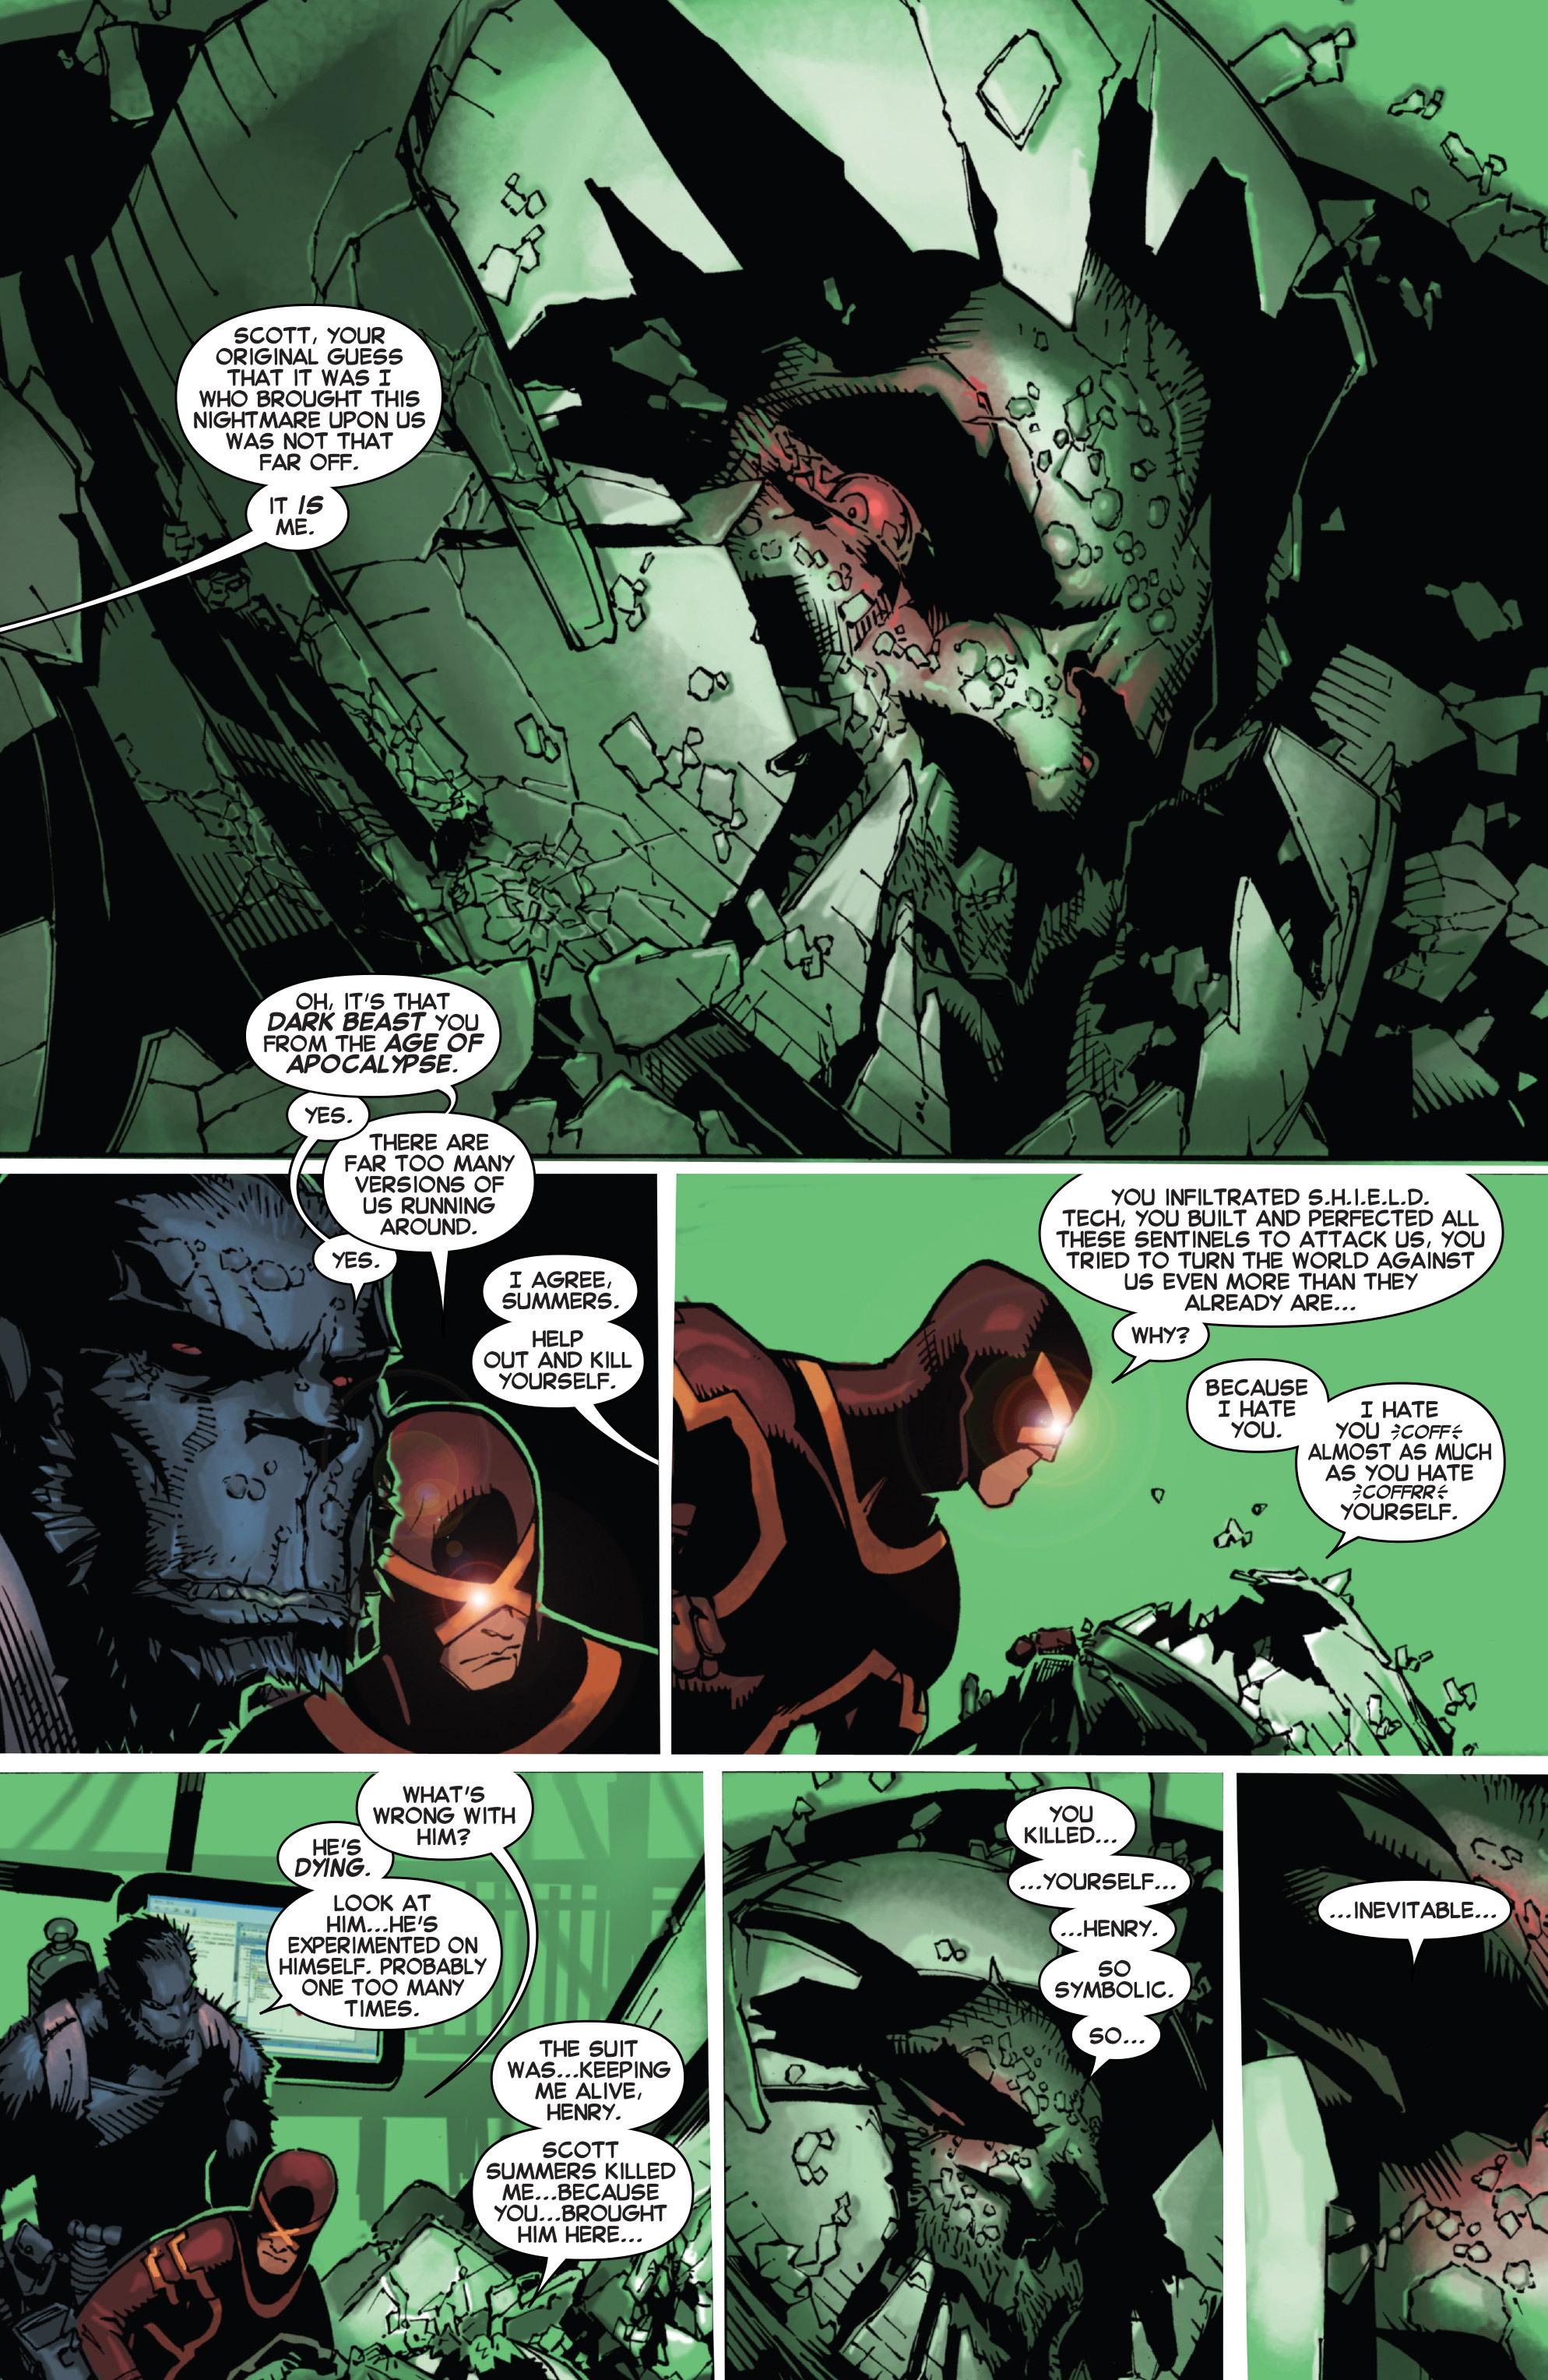 Read online Uncanny X-Men (2013) comic -  Issue # _TPB 4 - vs. S.H.I.E.L.D - 75